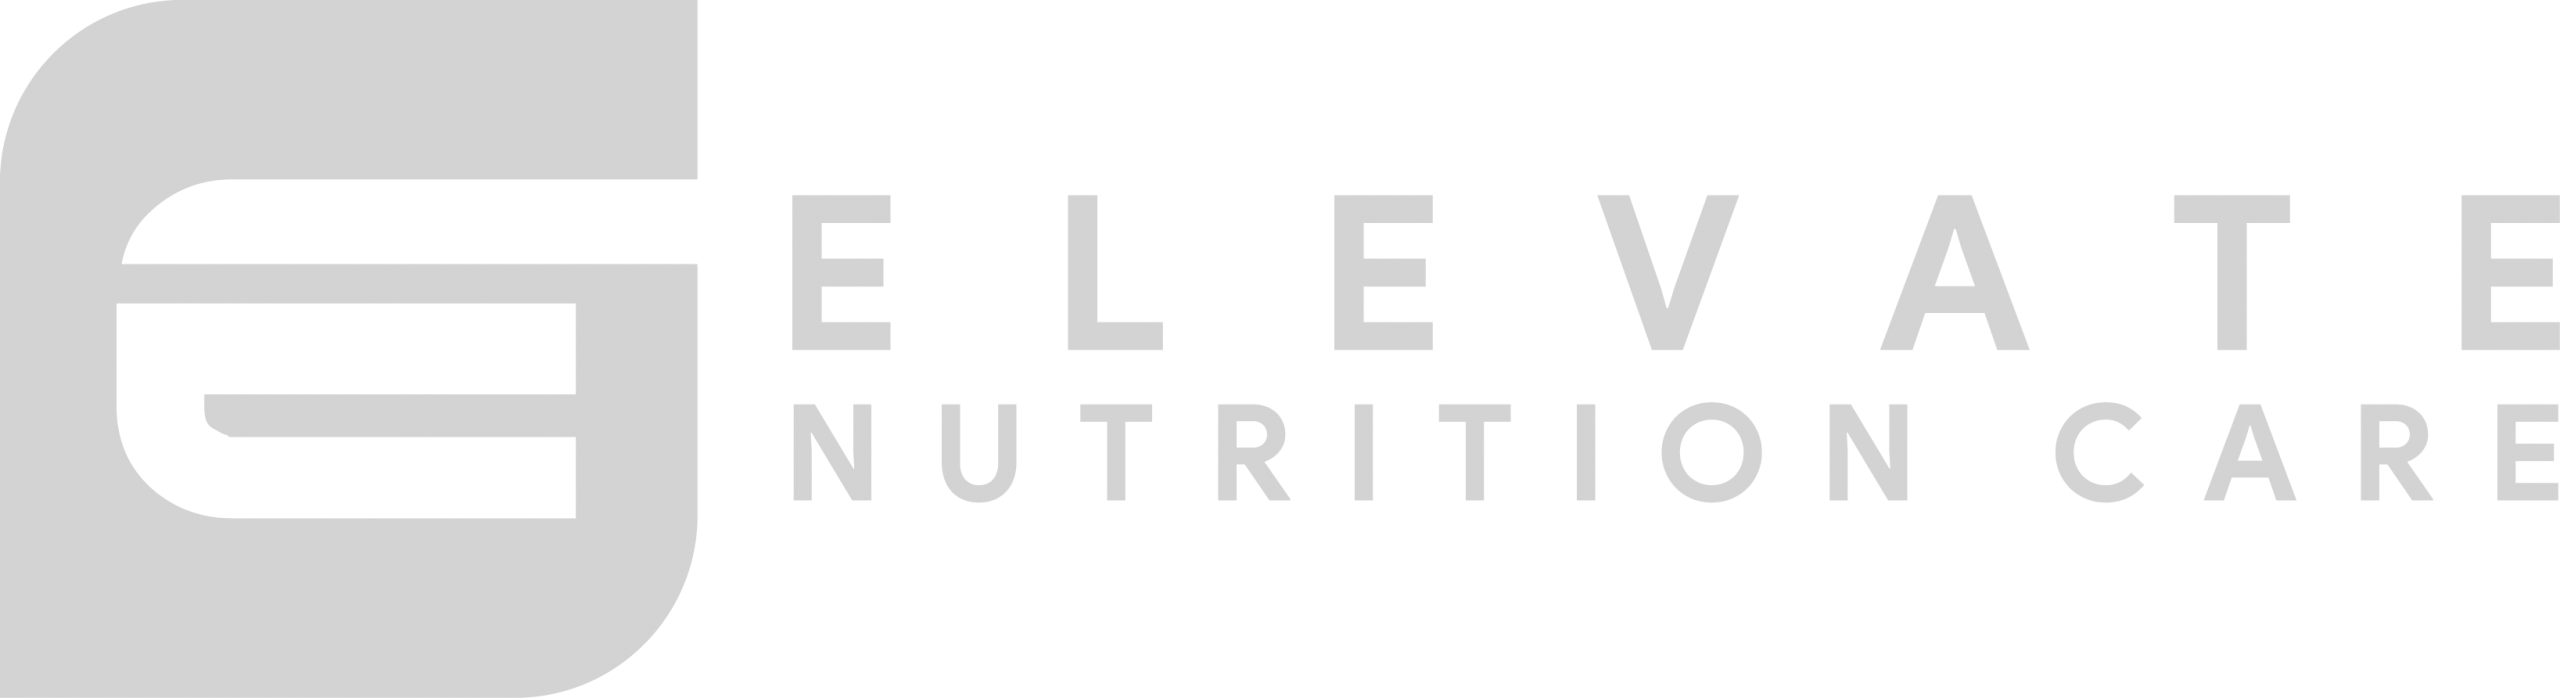 Elevate Nutrition – Cabinet Nutritie Oradea